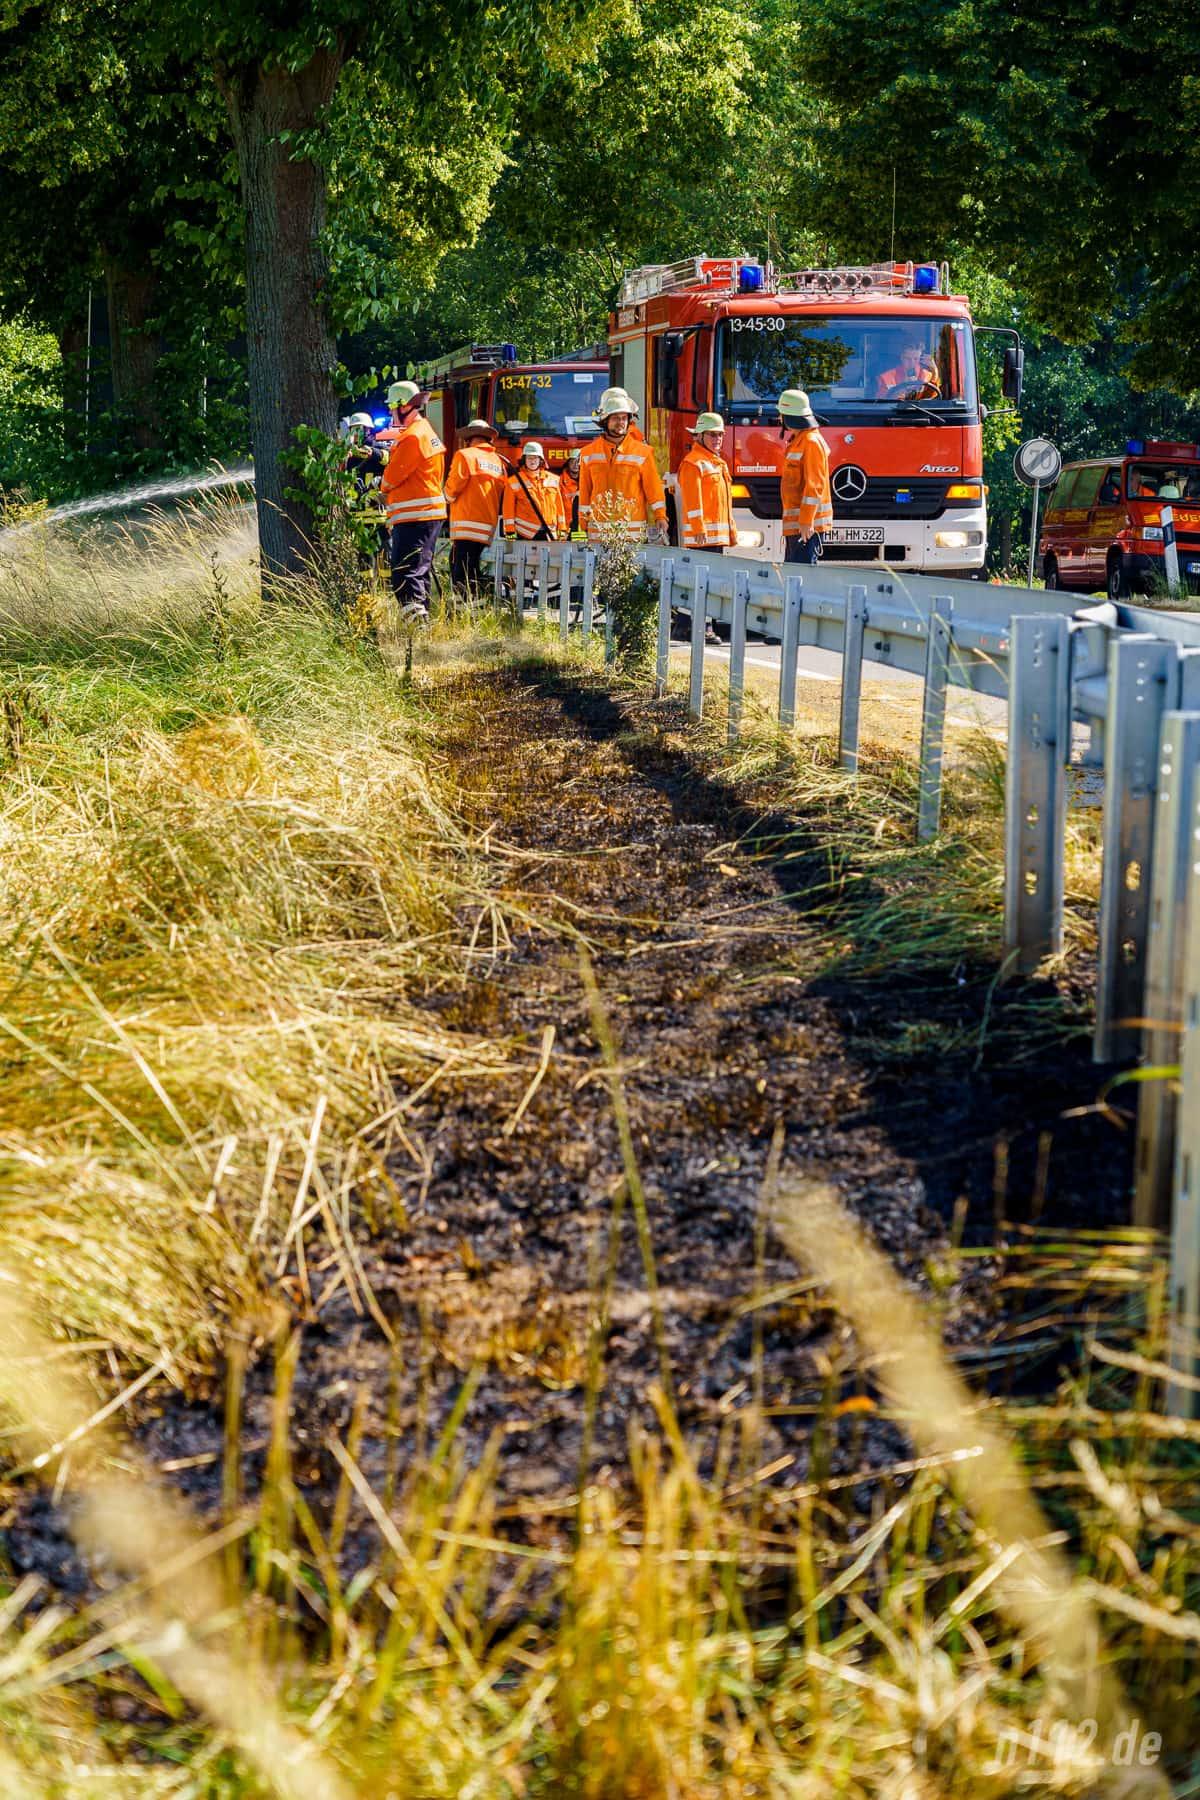 25-30 Meter Grünstreifen waren in Brand geraten (Foto: n112.de/Stefanm Simonsen)